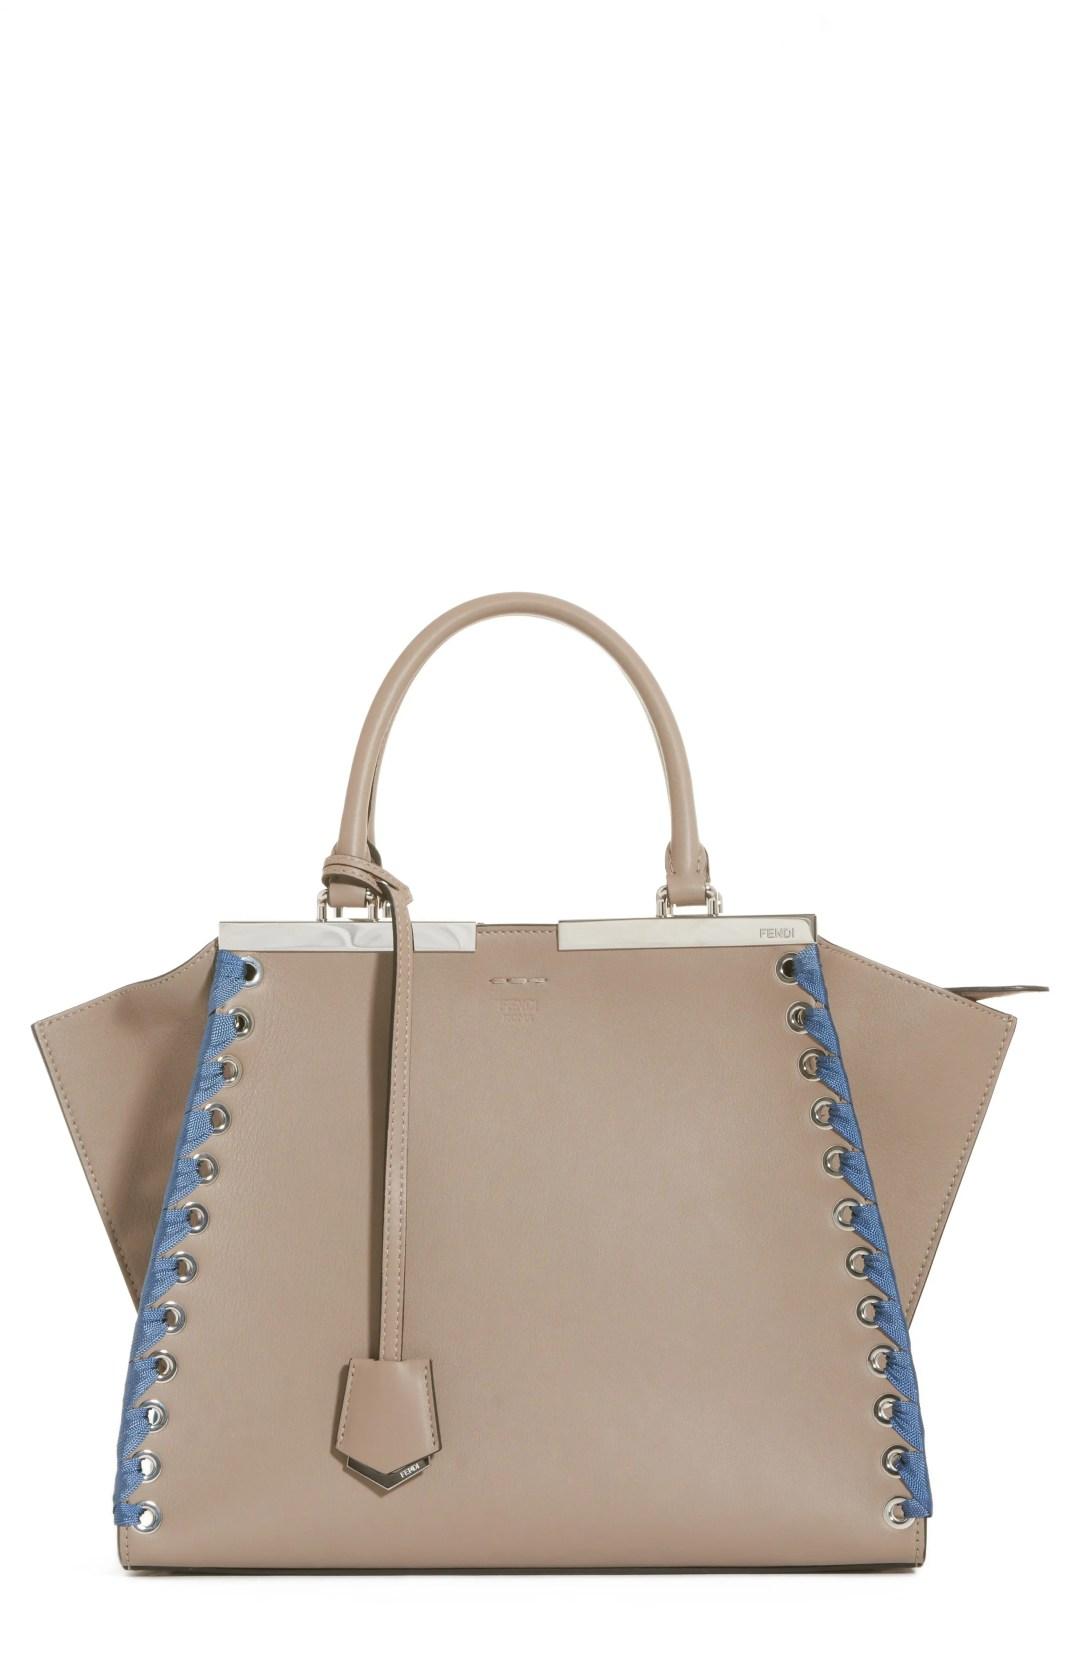 7d1983c1bfd0 ... $3,190.00. – Fendi 3Jours Calfskin Leather Shopper – – NORDSTROM.com –  $3,190.00